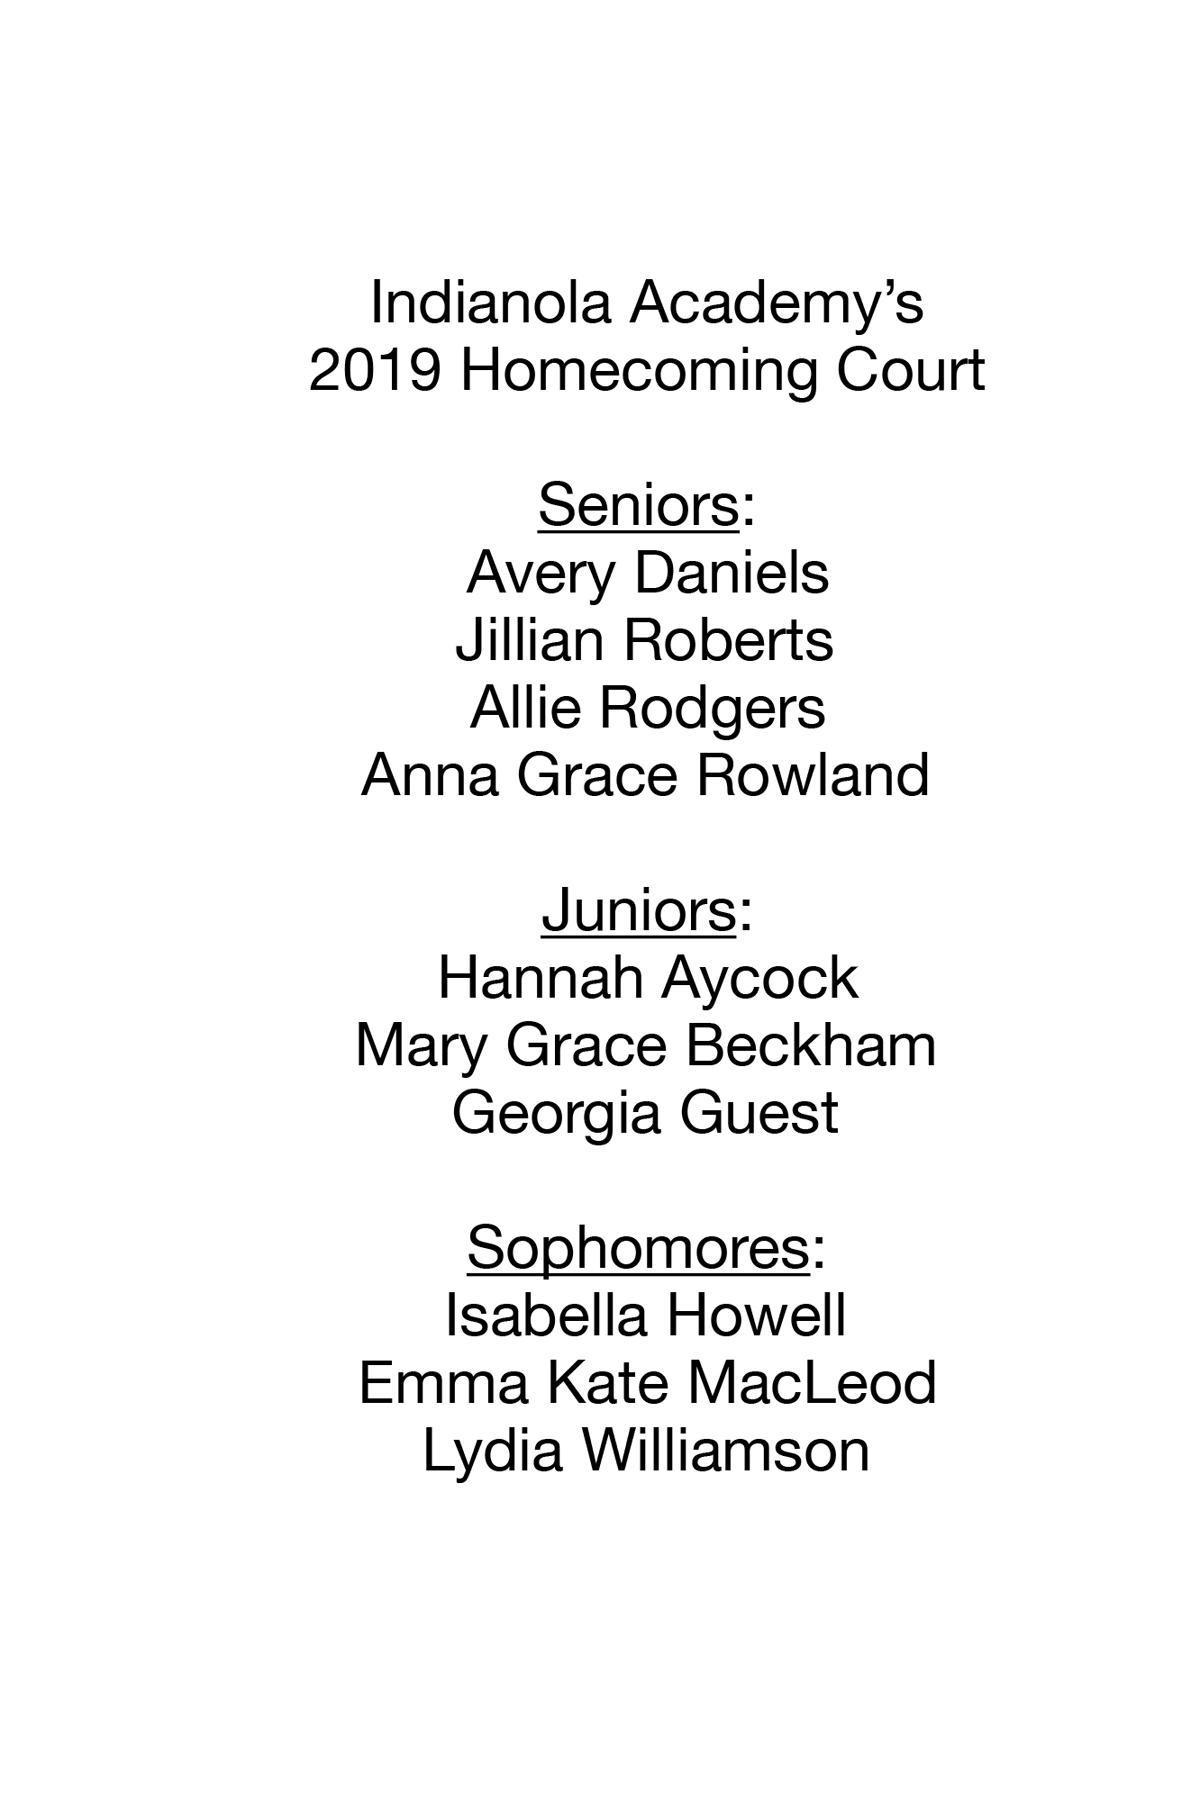 IA Homecoming Court 2019